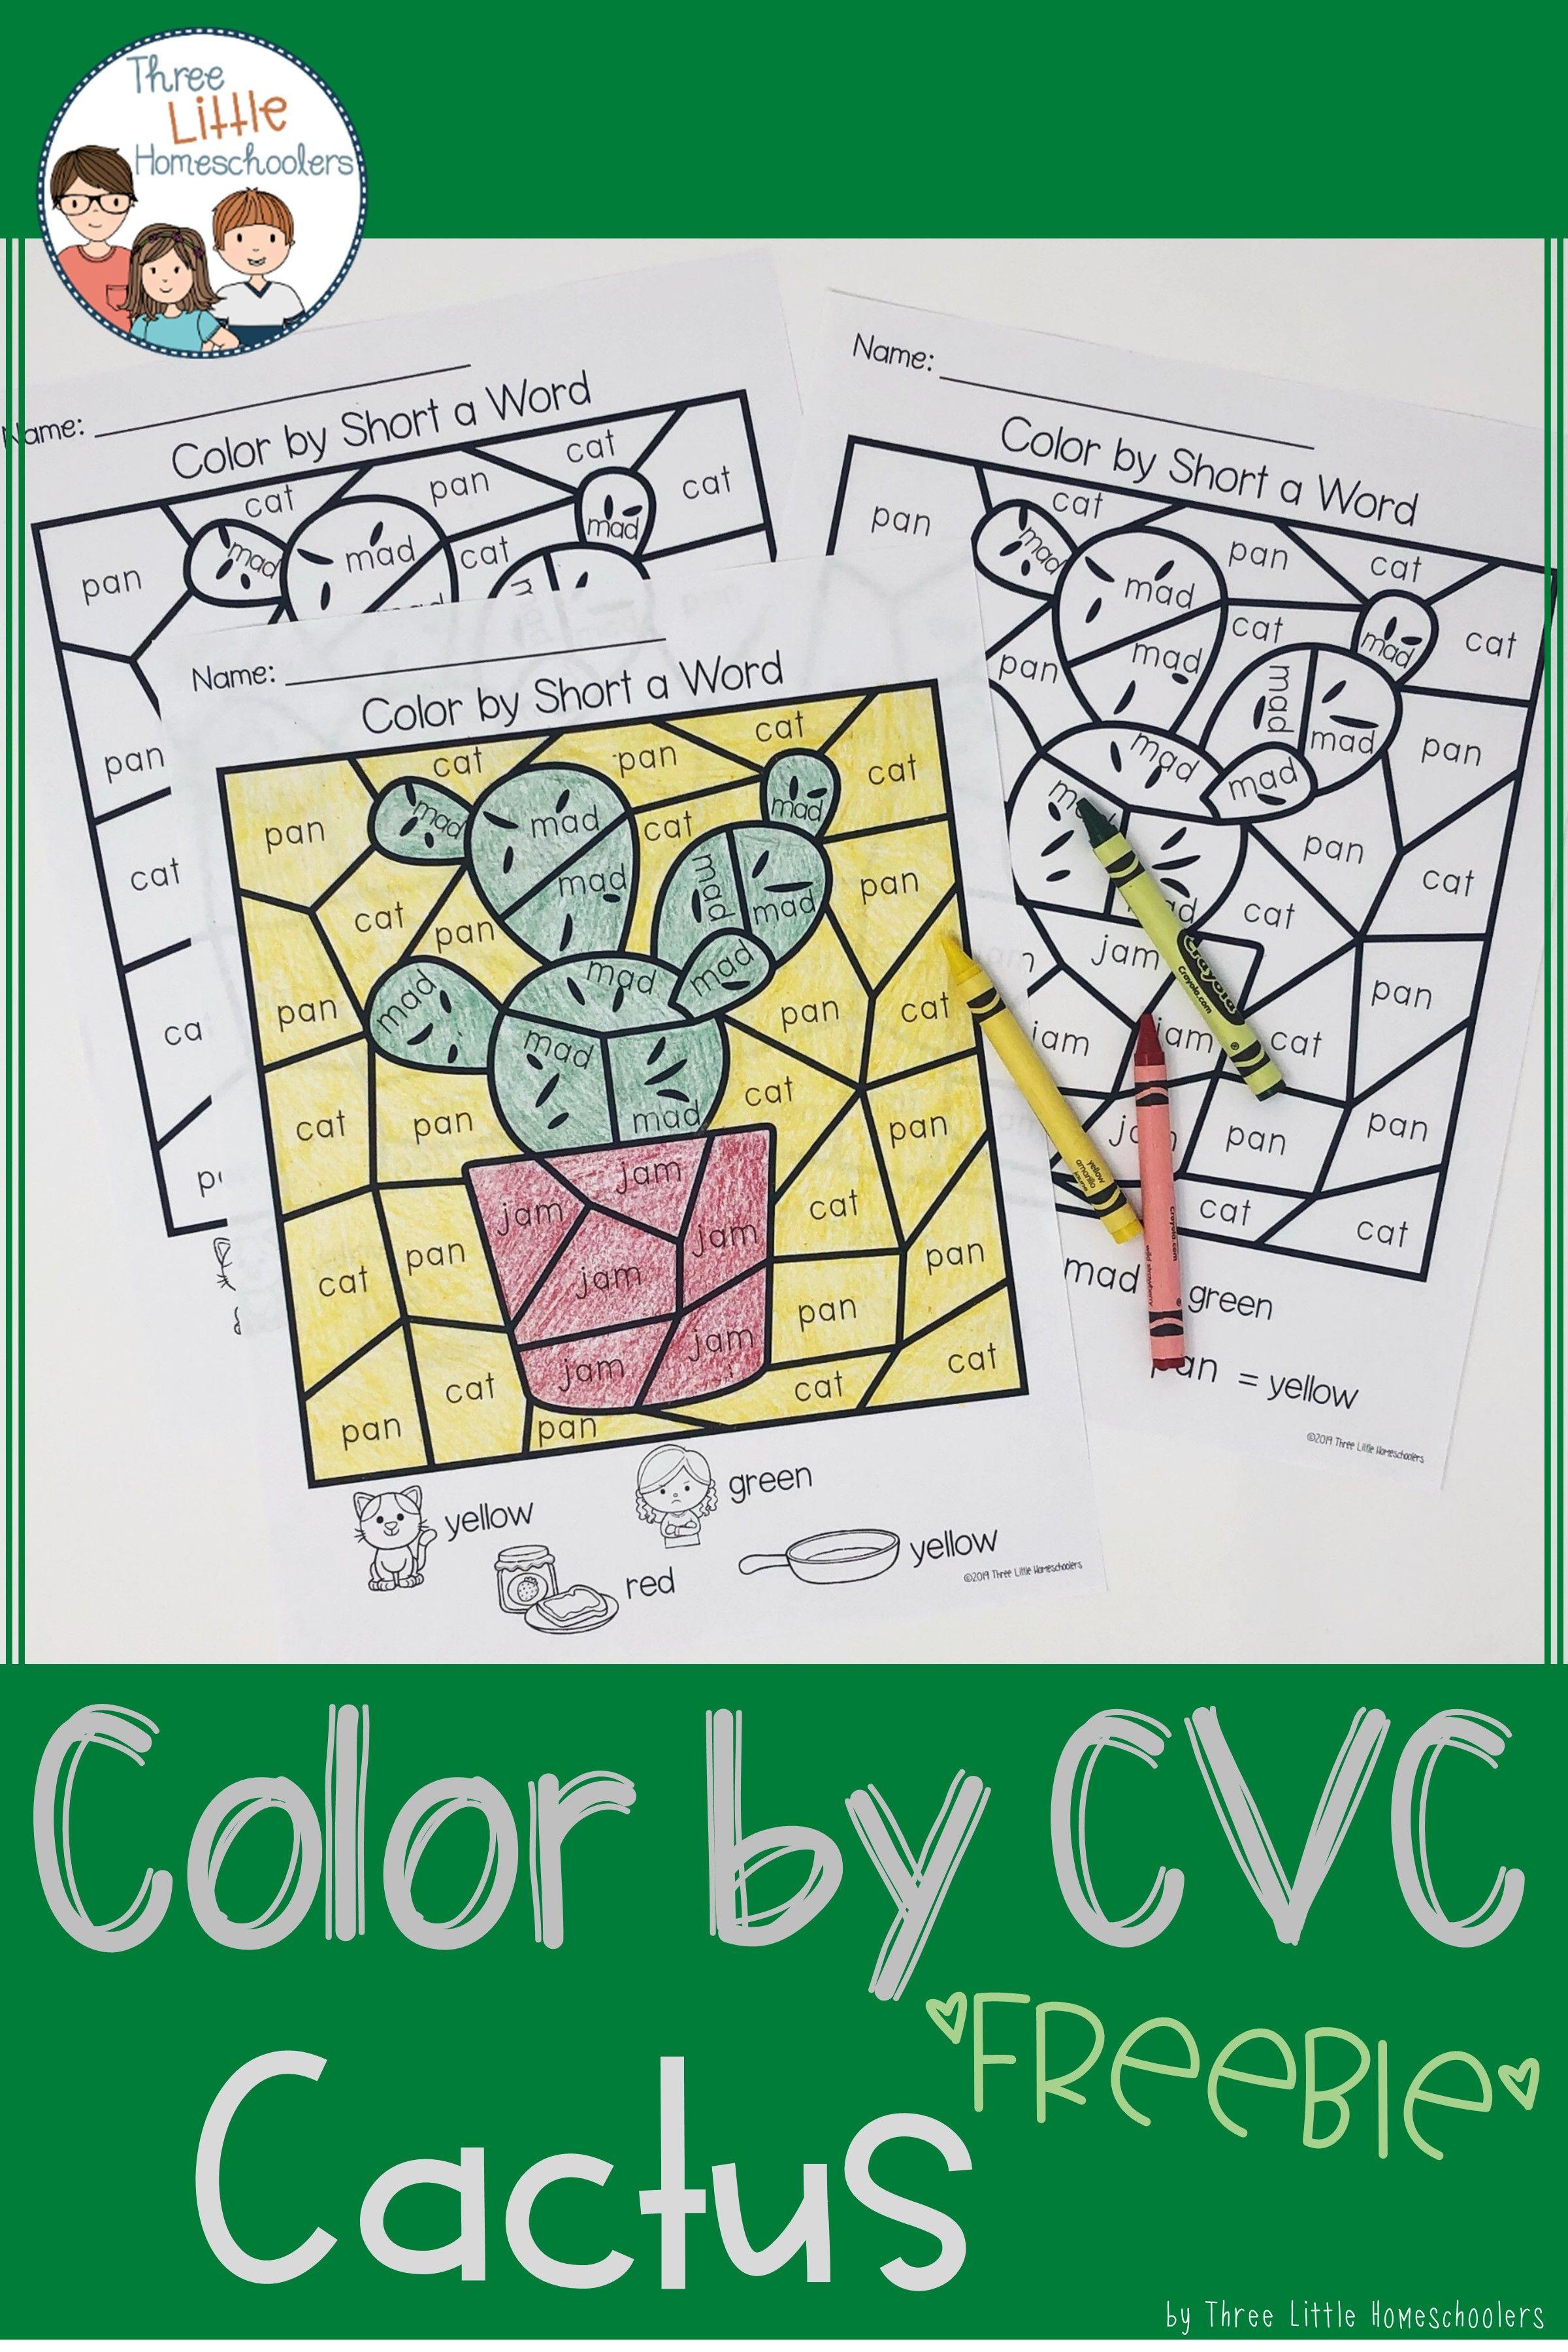 Cactus Color By Cvc Word Freebie